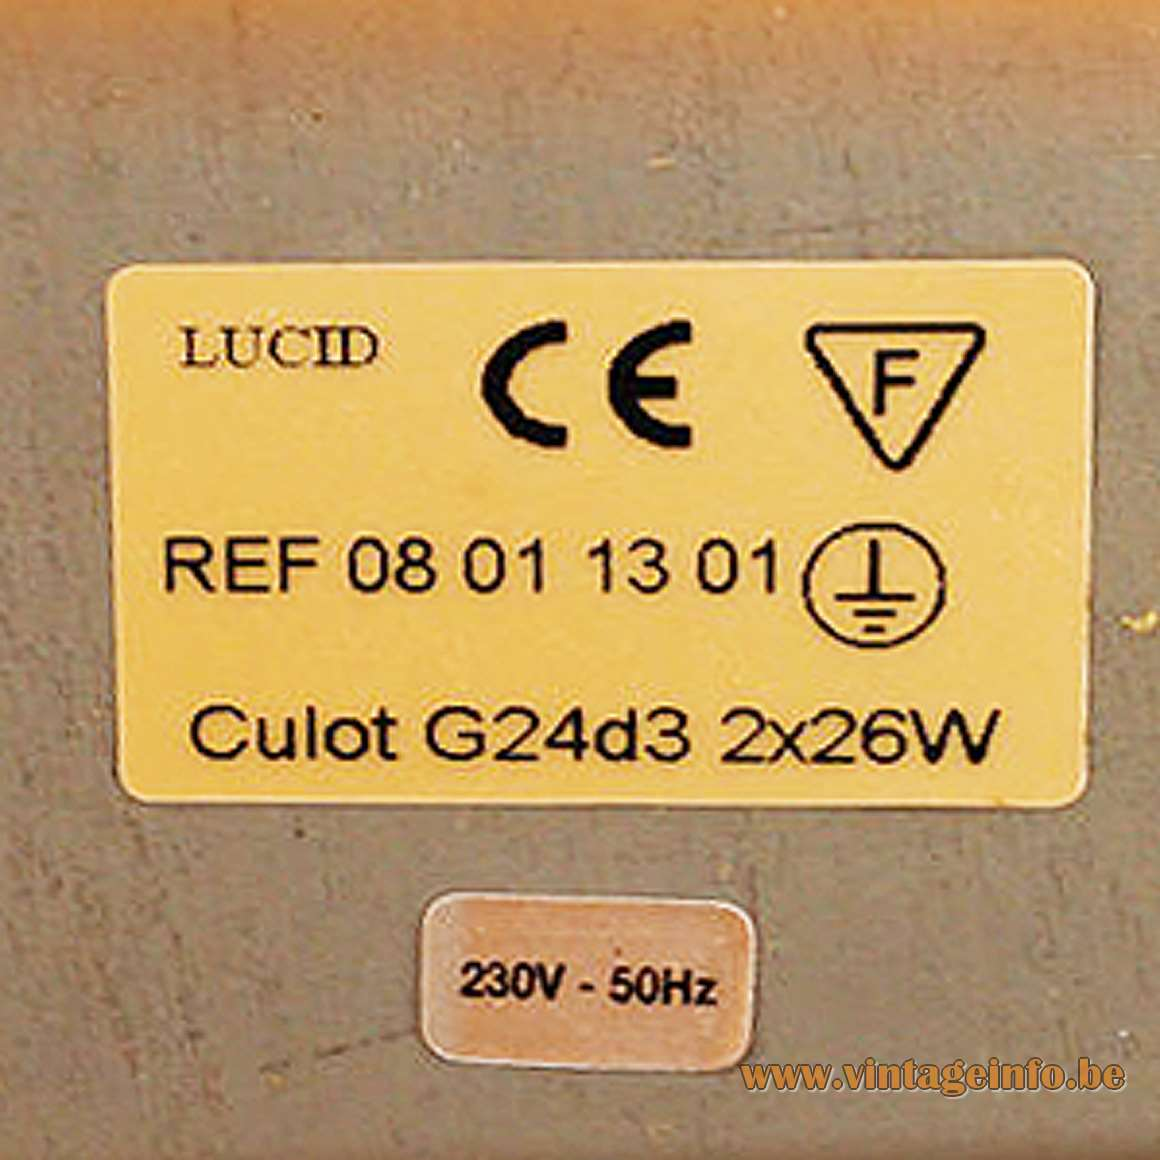 Lucid Harmonie table lamp curved plywood white acrylic 1990s Culot G24D3 designer: Soren Eriksen SEDAP